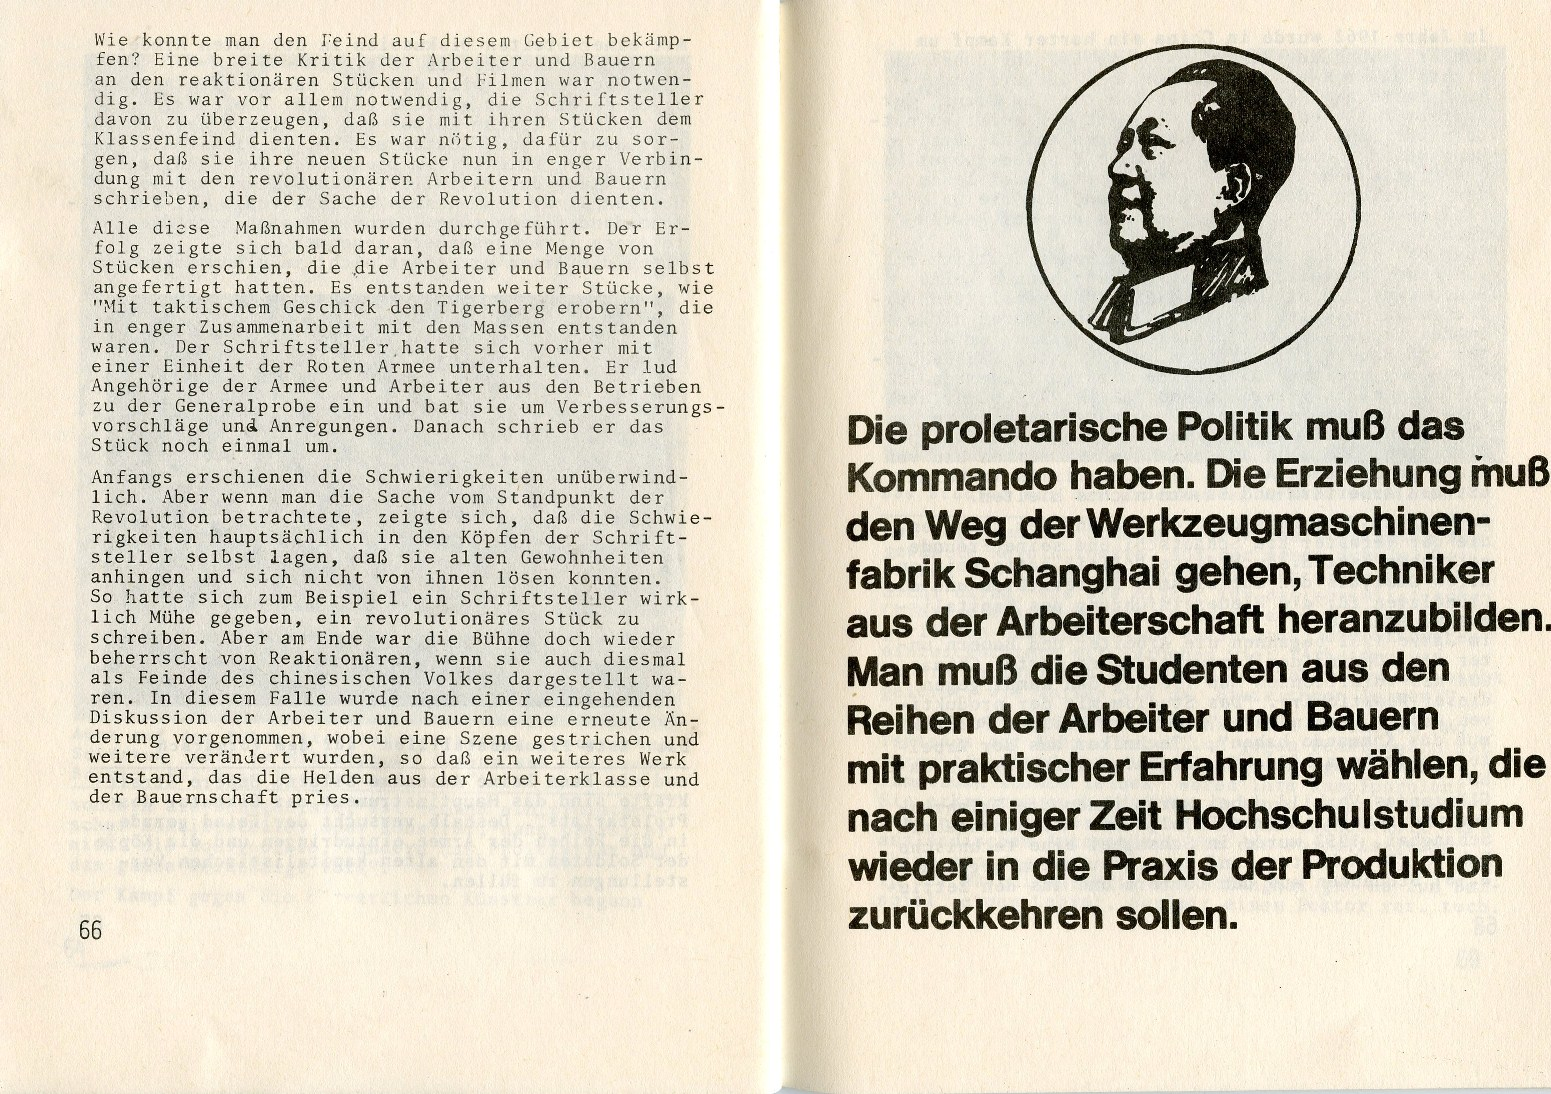 ZB_KPChinas_1971_35